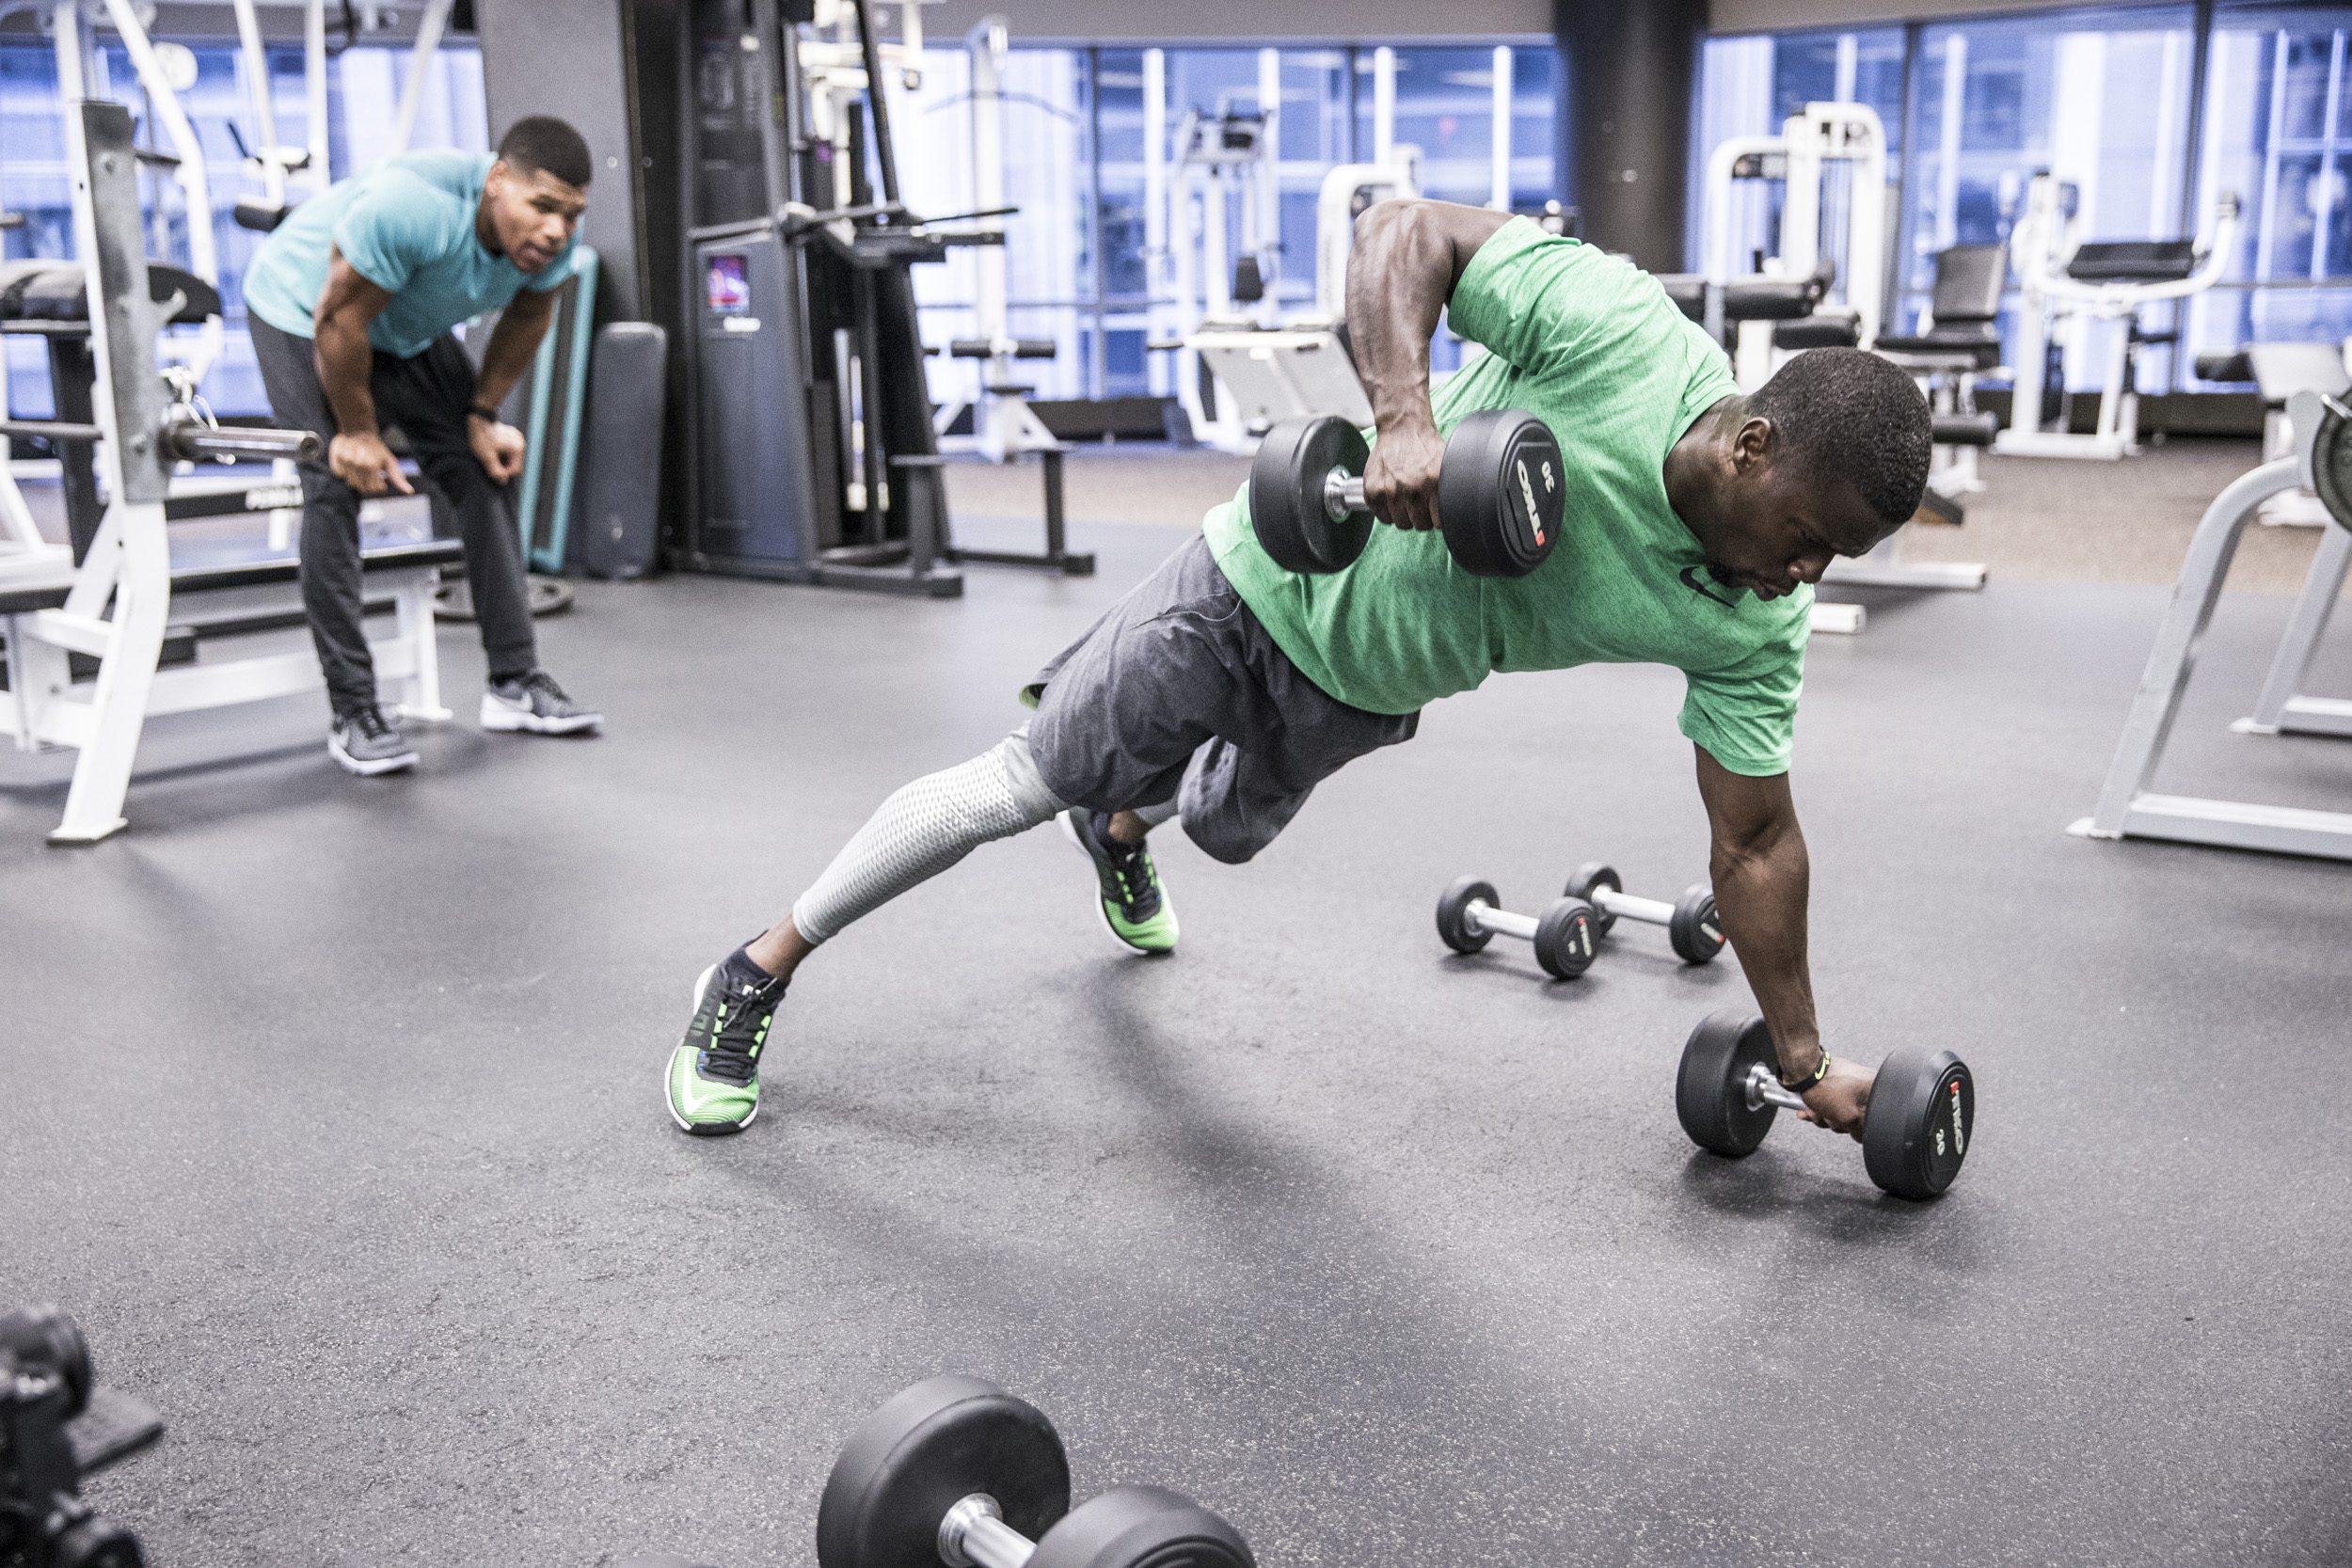 15103_Nike_GC_Kevin_Hart_Gym-154_50200.jpg